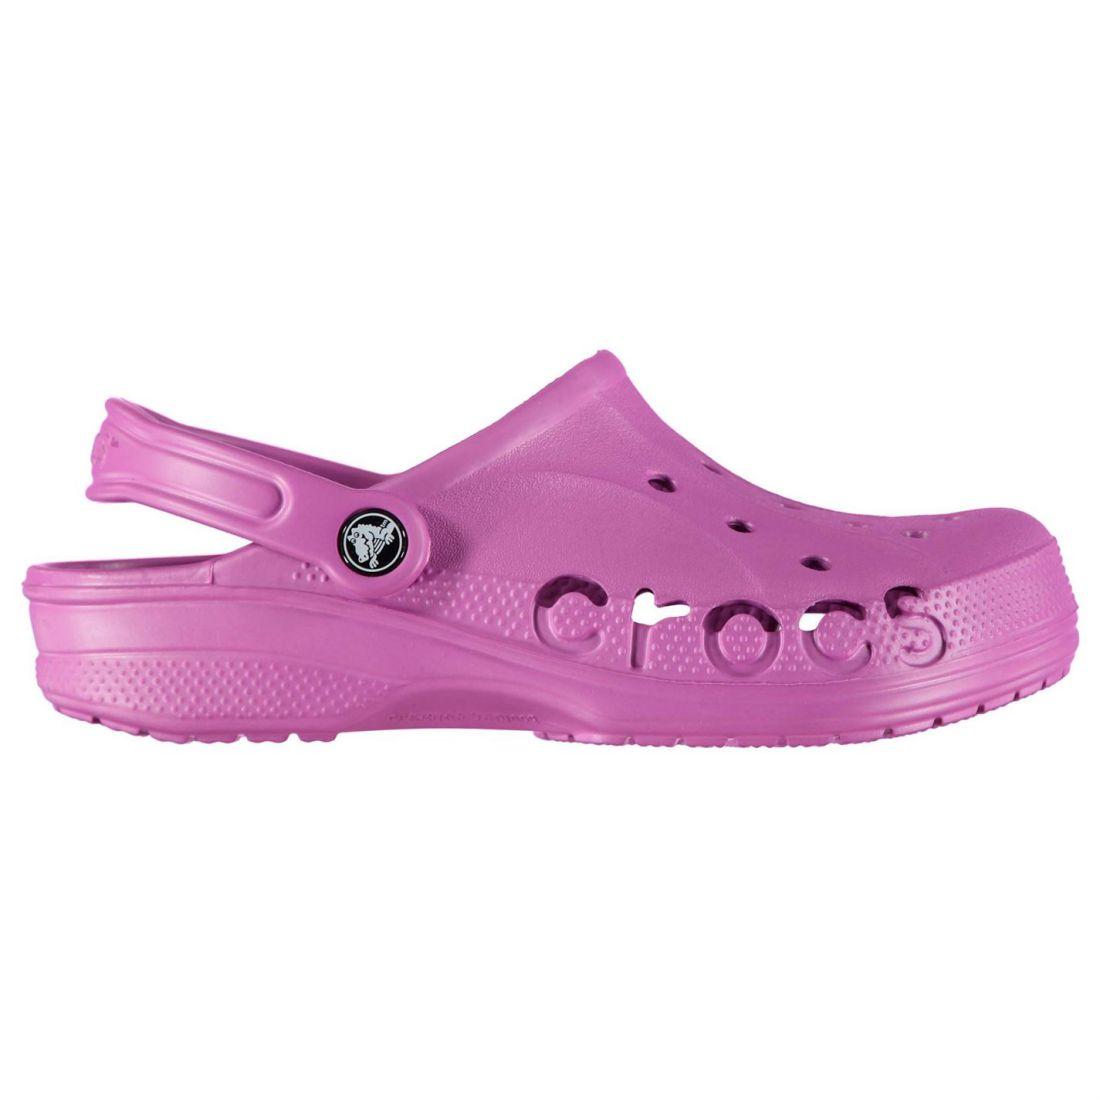 c87b332df Crocs Womens Baya Clogs Shoes Slip On Sling Strap Perforation ...